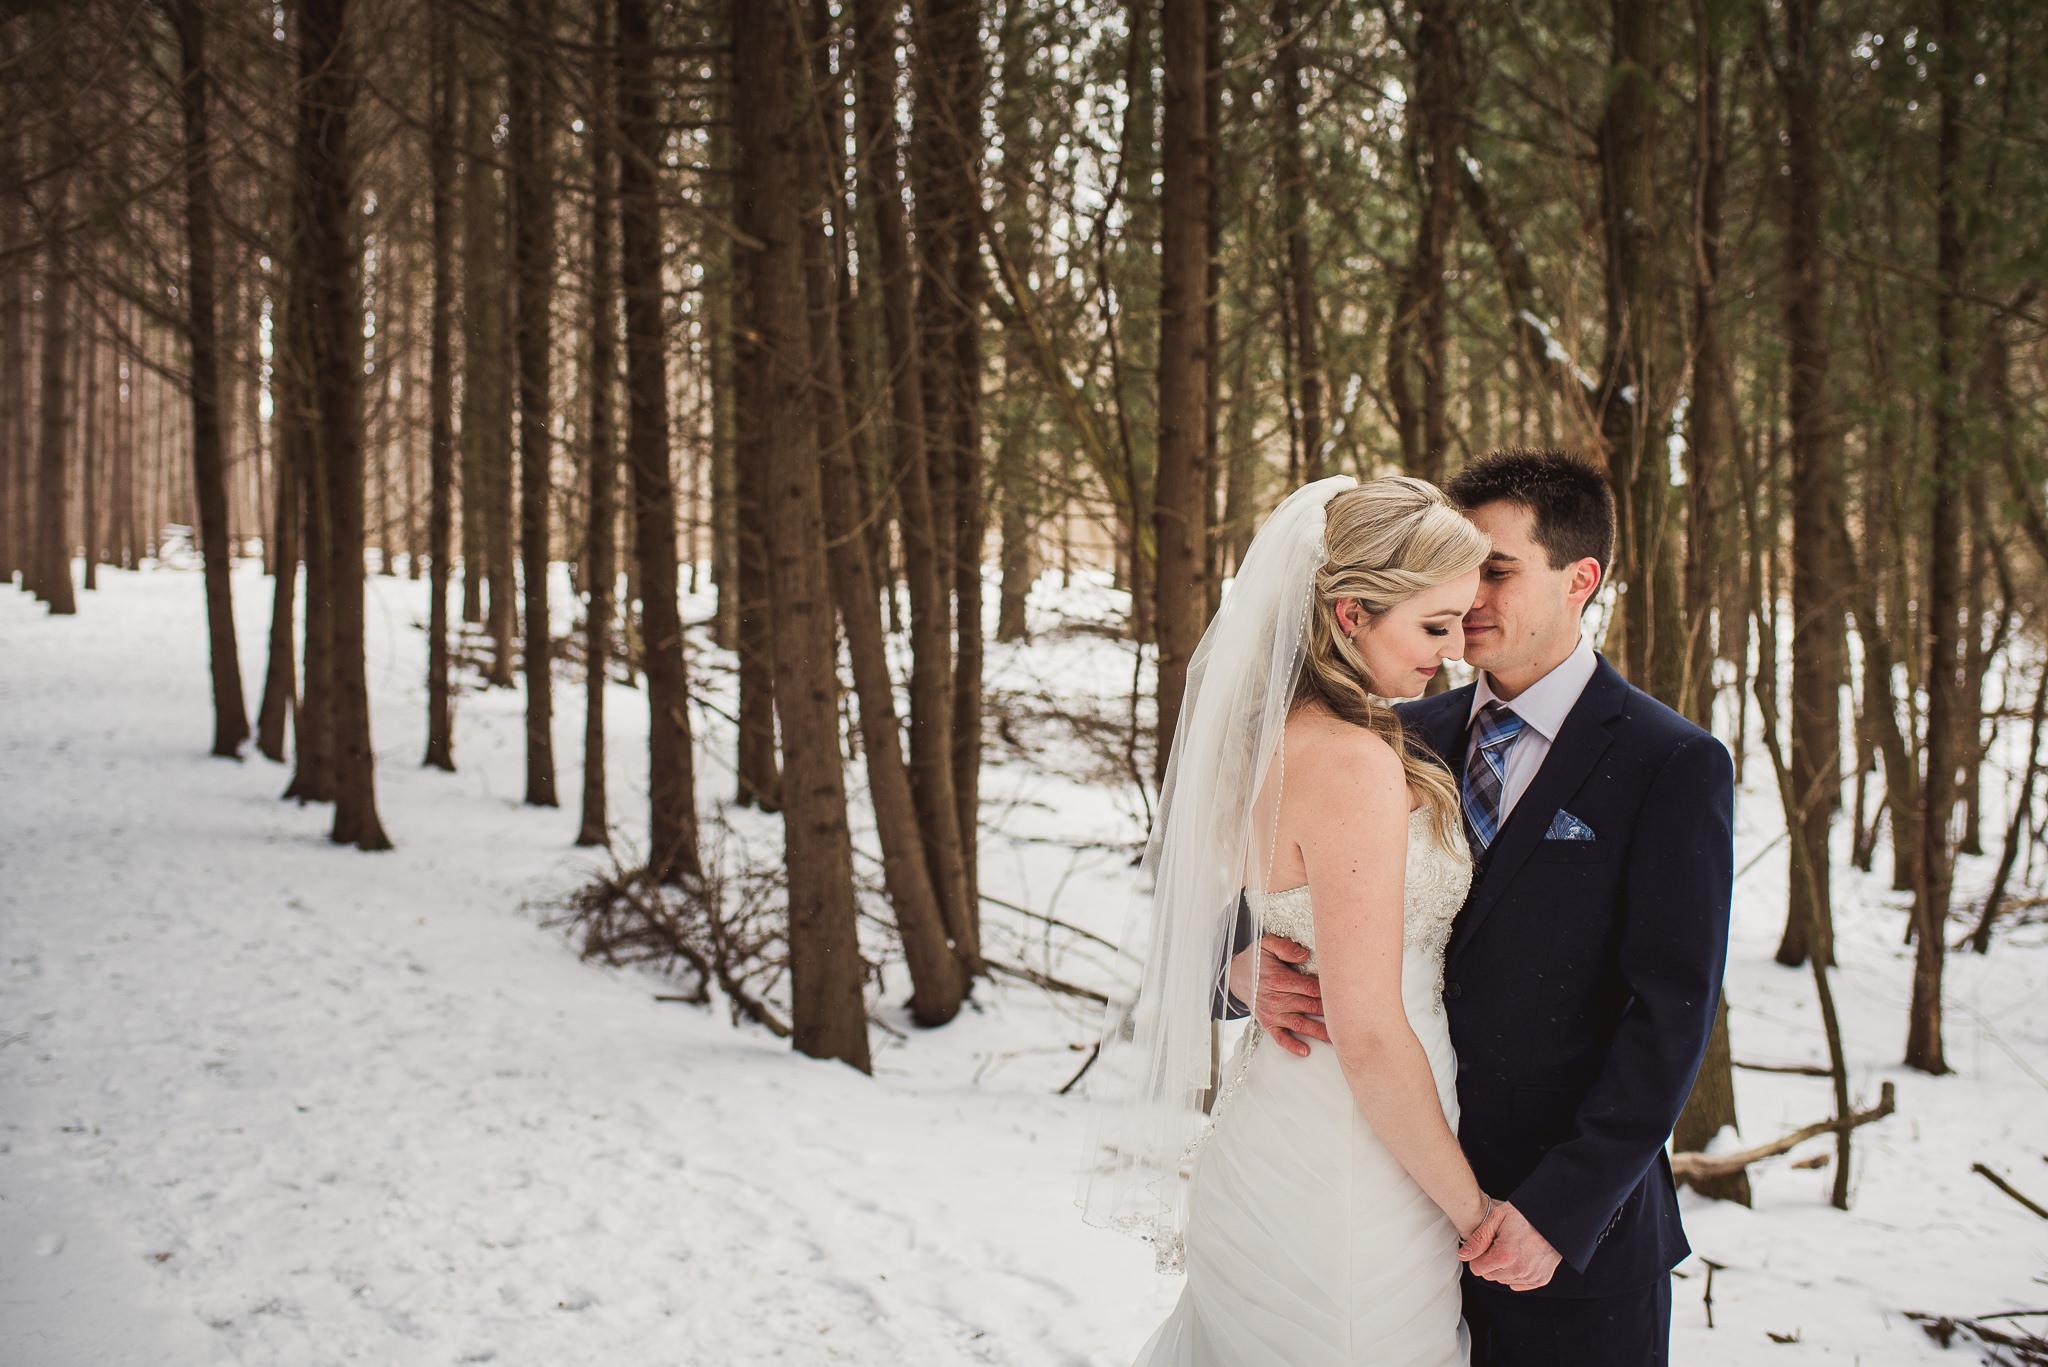 kortright center winter wedding photos 144 - Kortright Center Winter Wedding Photos